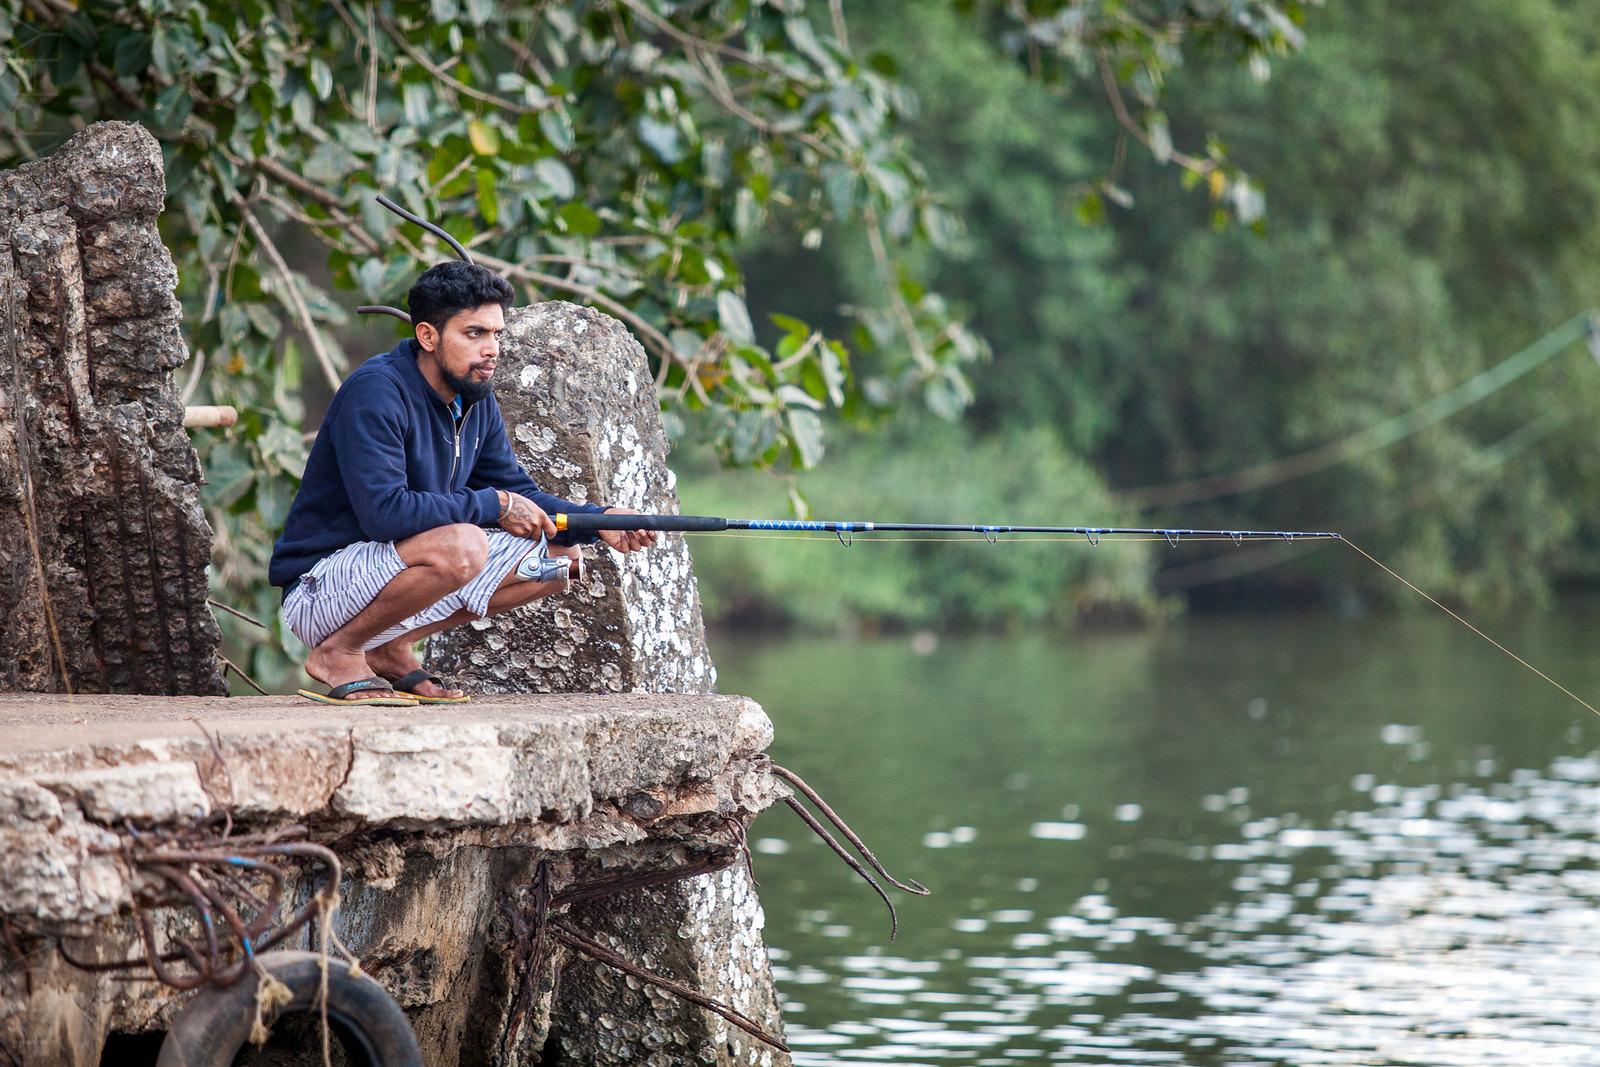 Local guy fishing